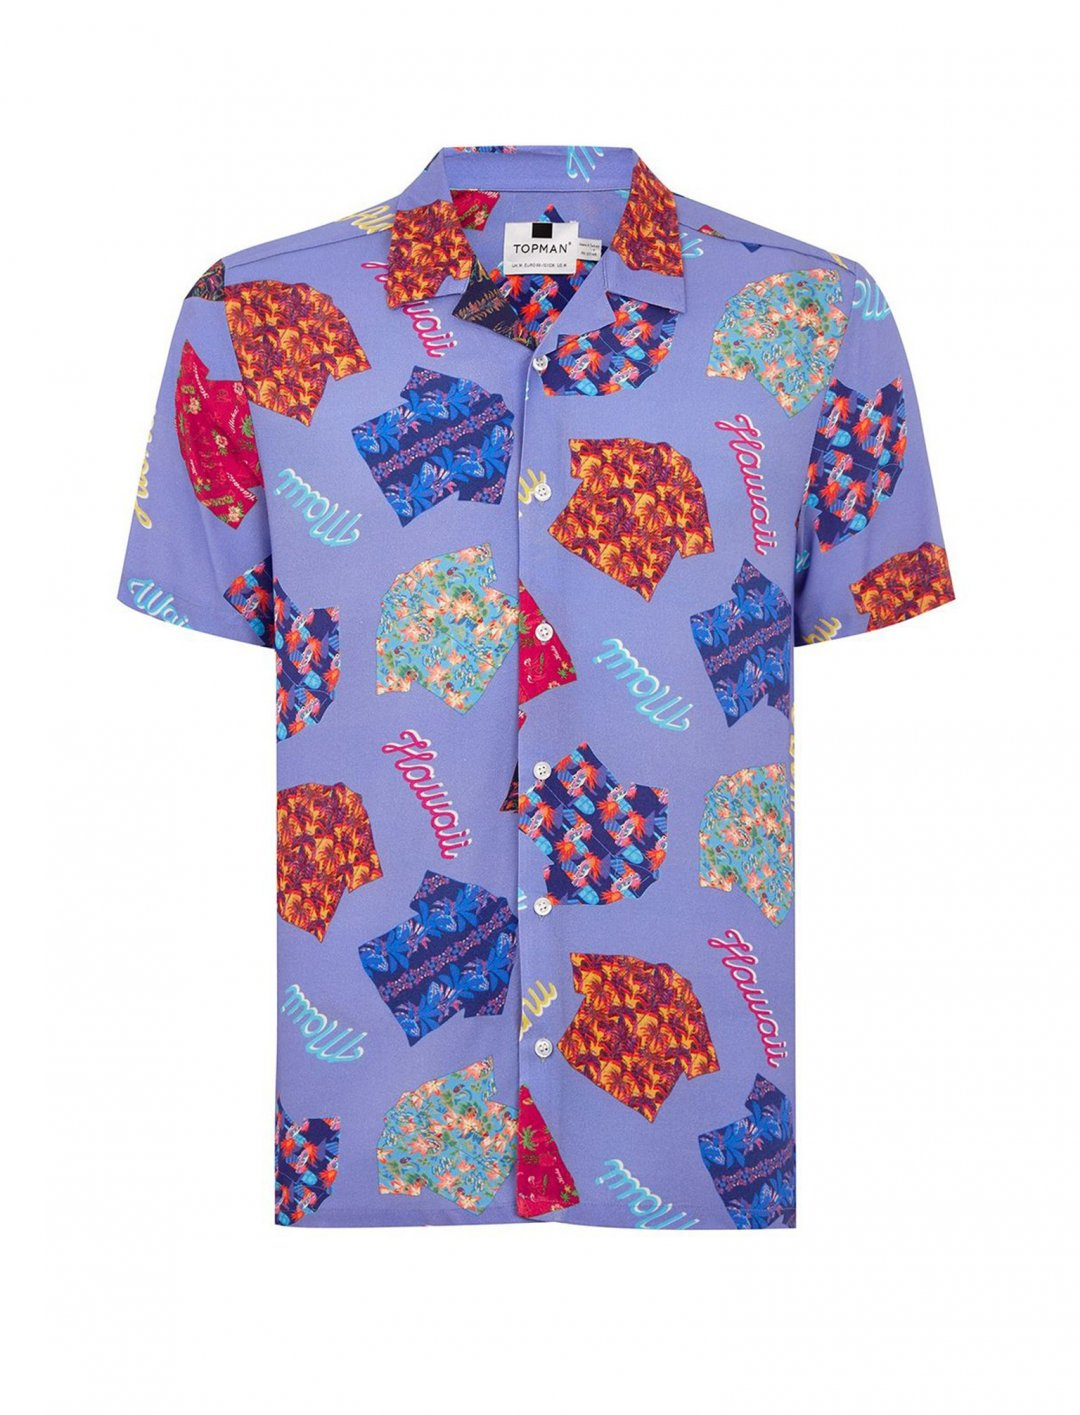 "Hawaiian Short Sleeve Shirt {""id"":5,""product_section_id"":1,""name"":""Clothing"",""order"":5} Topman"